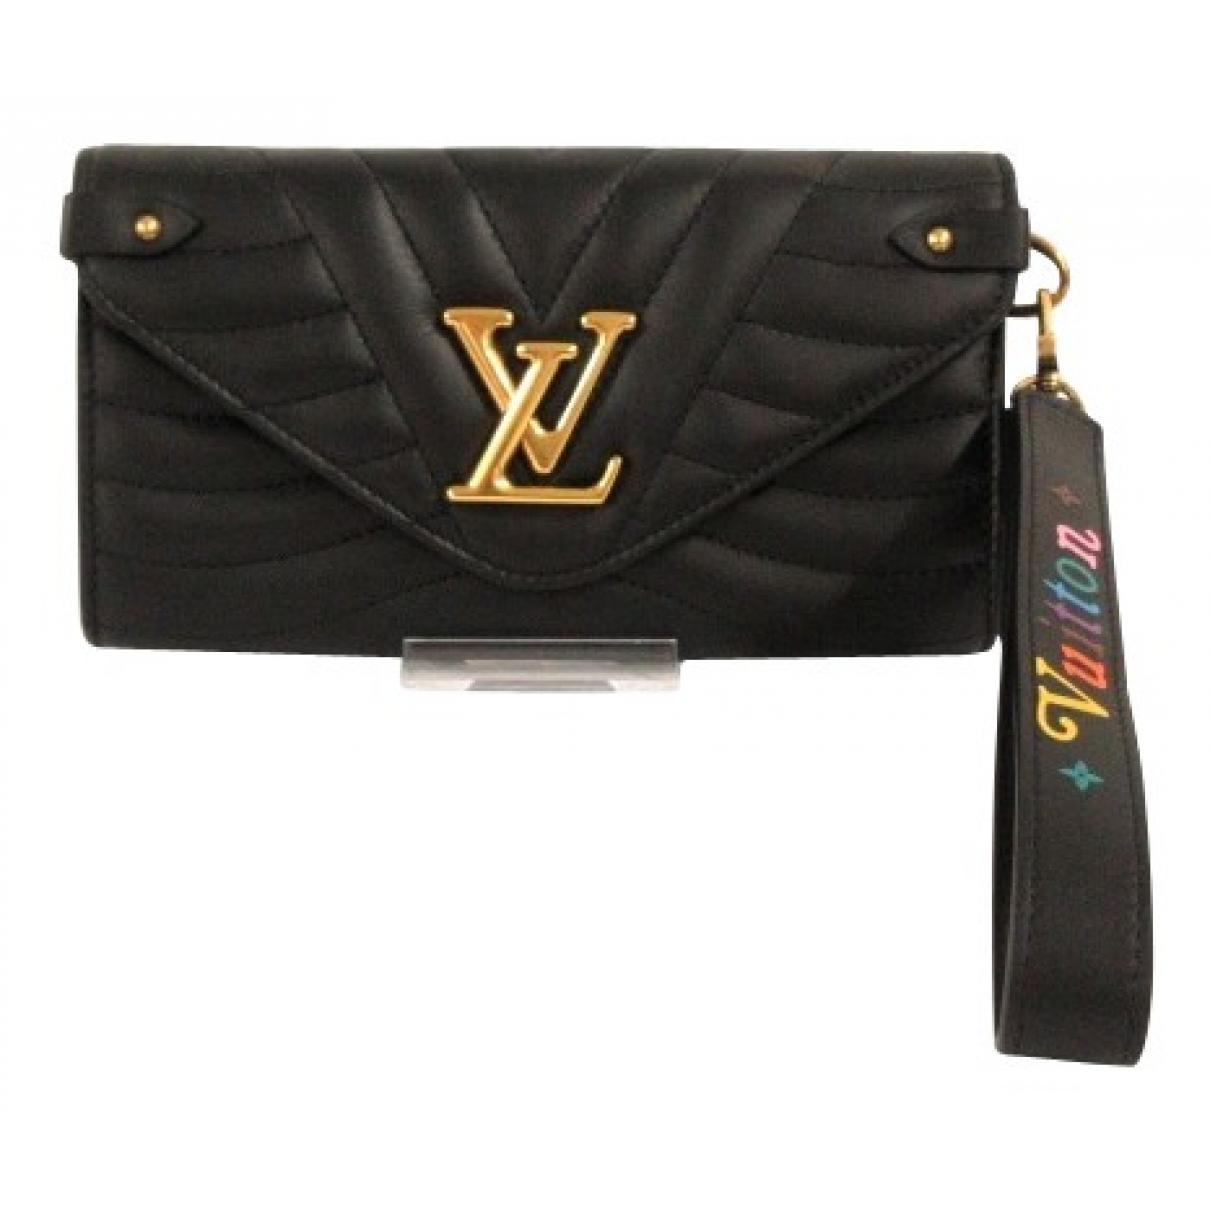 Billetero New Wave de Cuero Louis Vuitton